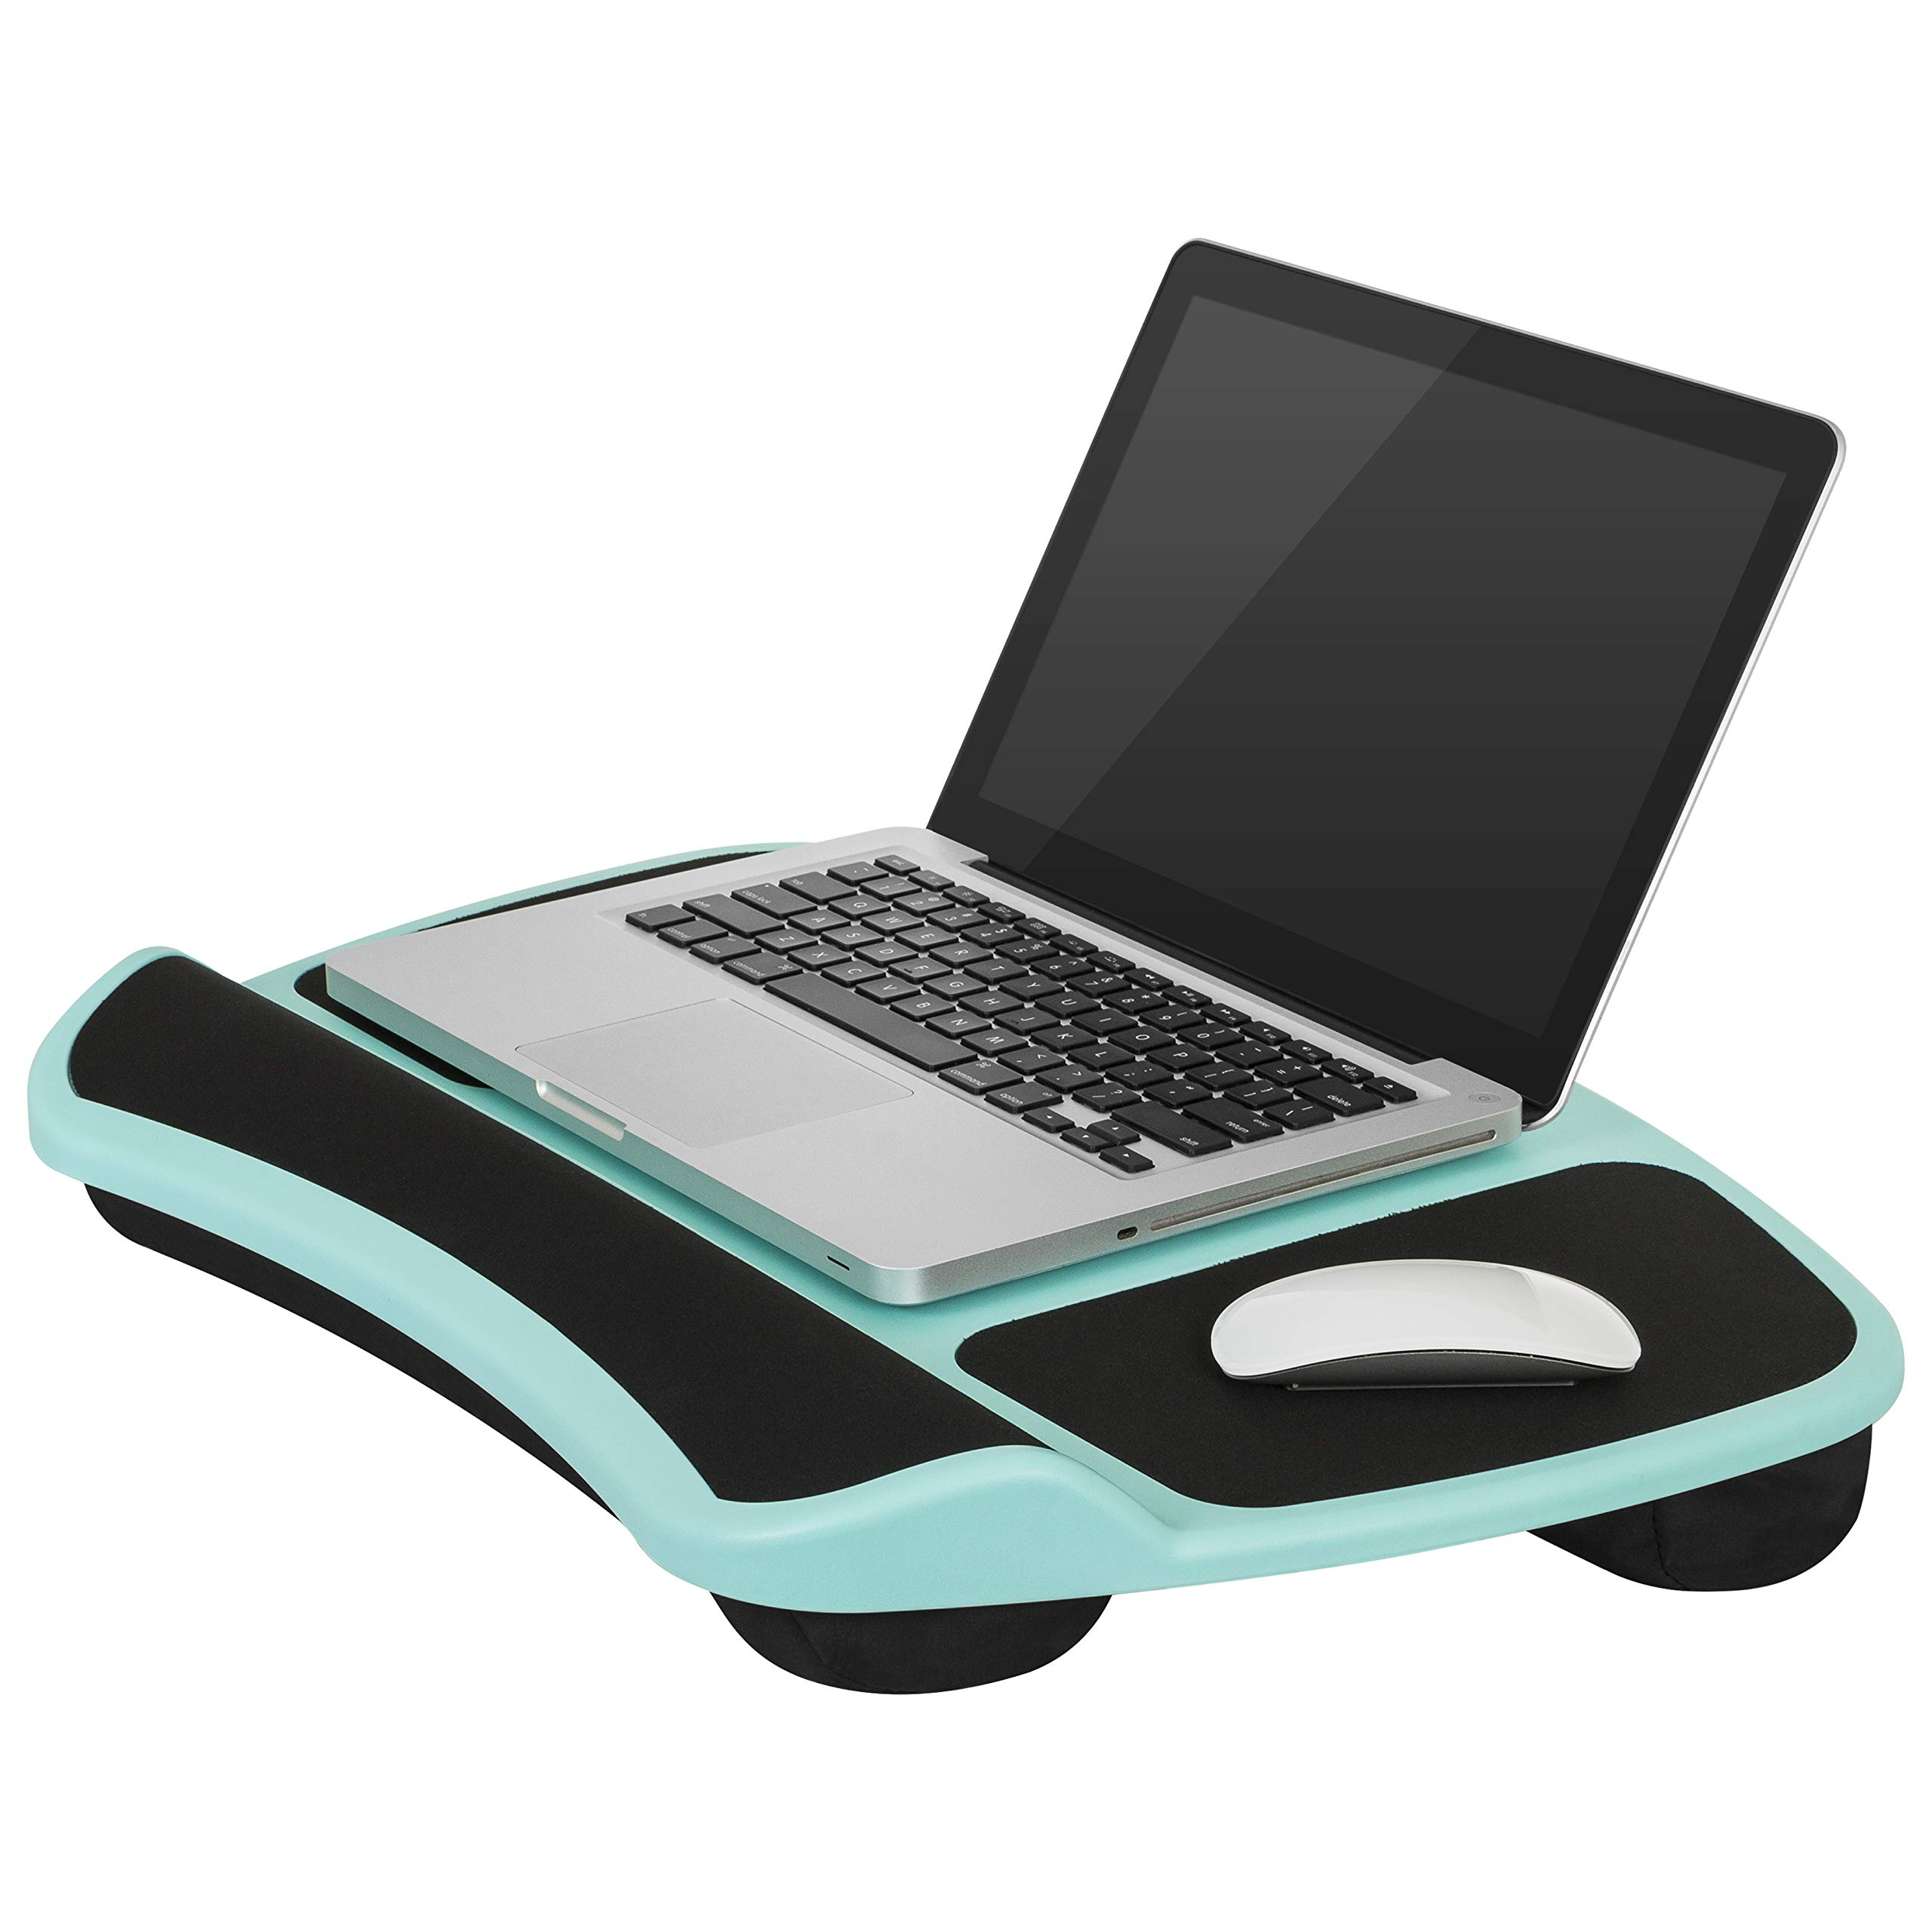 LapGear Laptop Lap Desk - Turquoise (Fits up to 15.6'' Laptop) - Style #45499